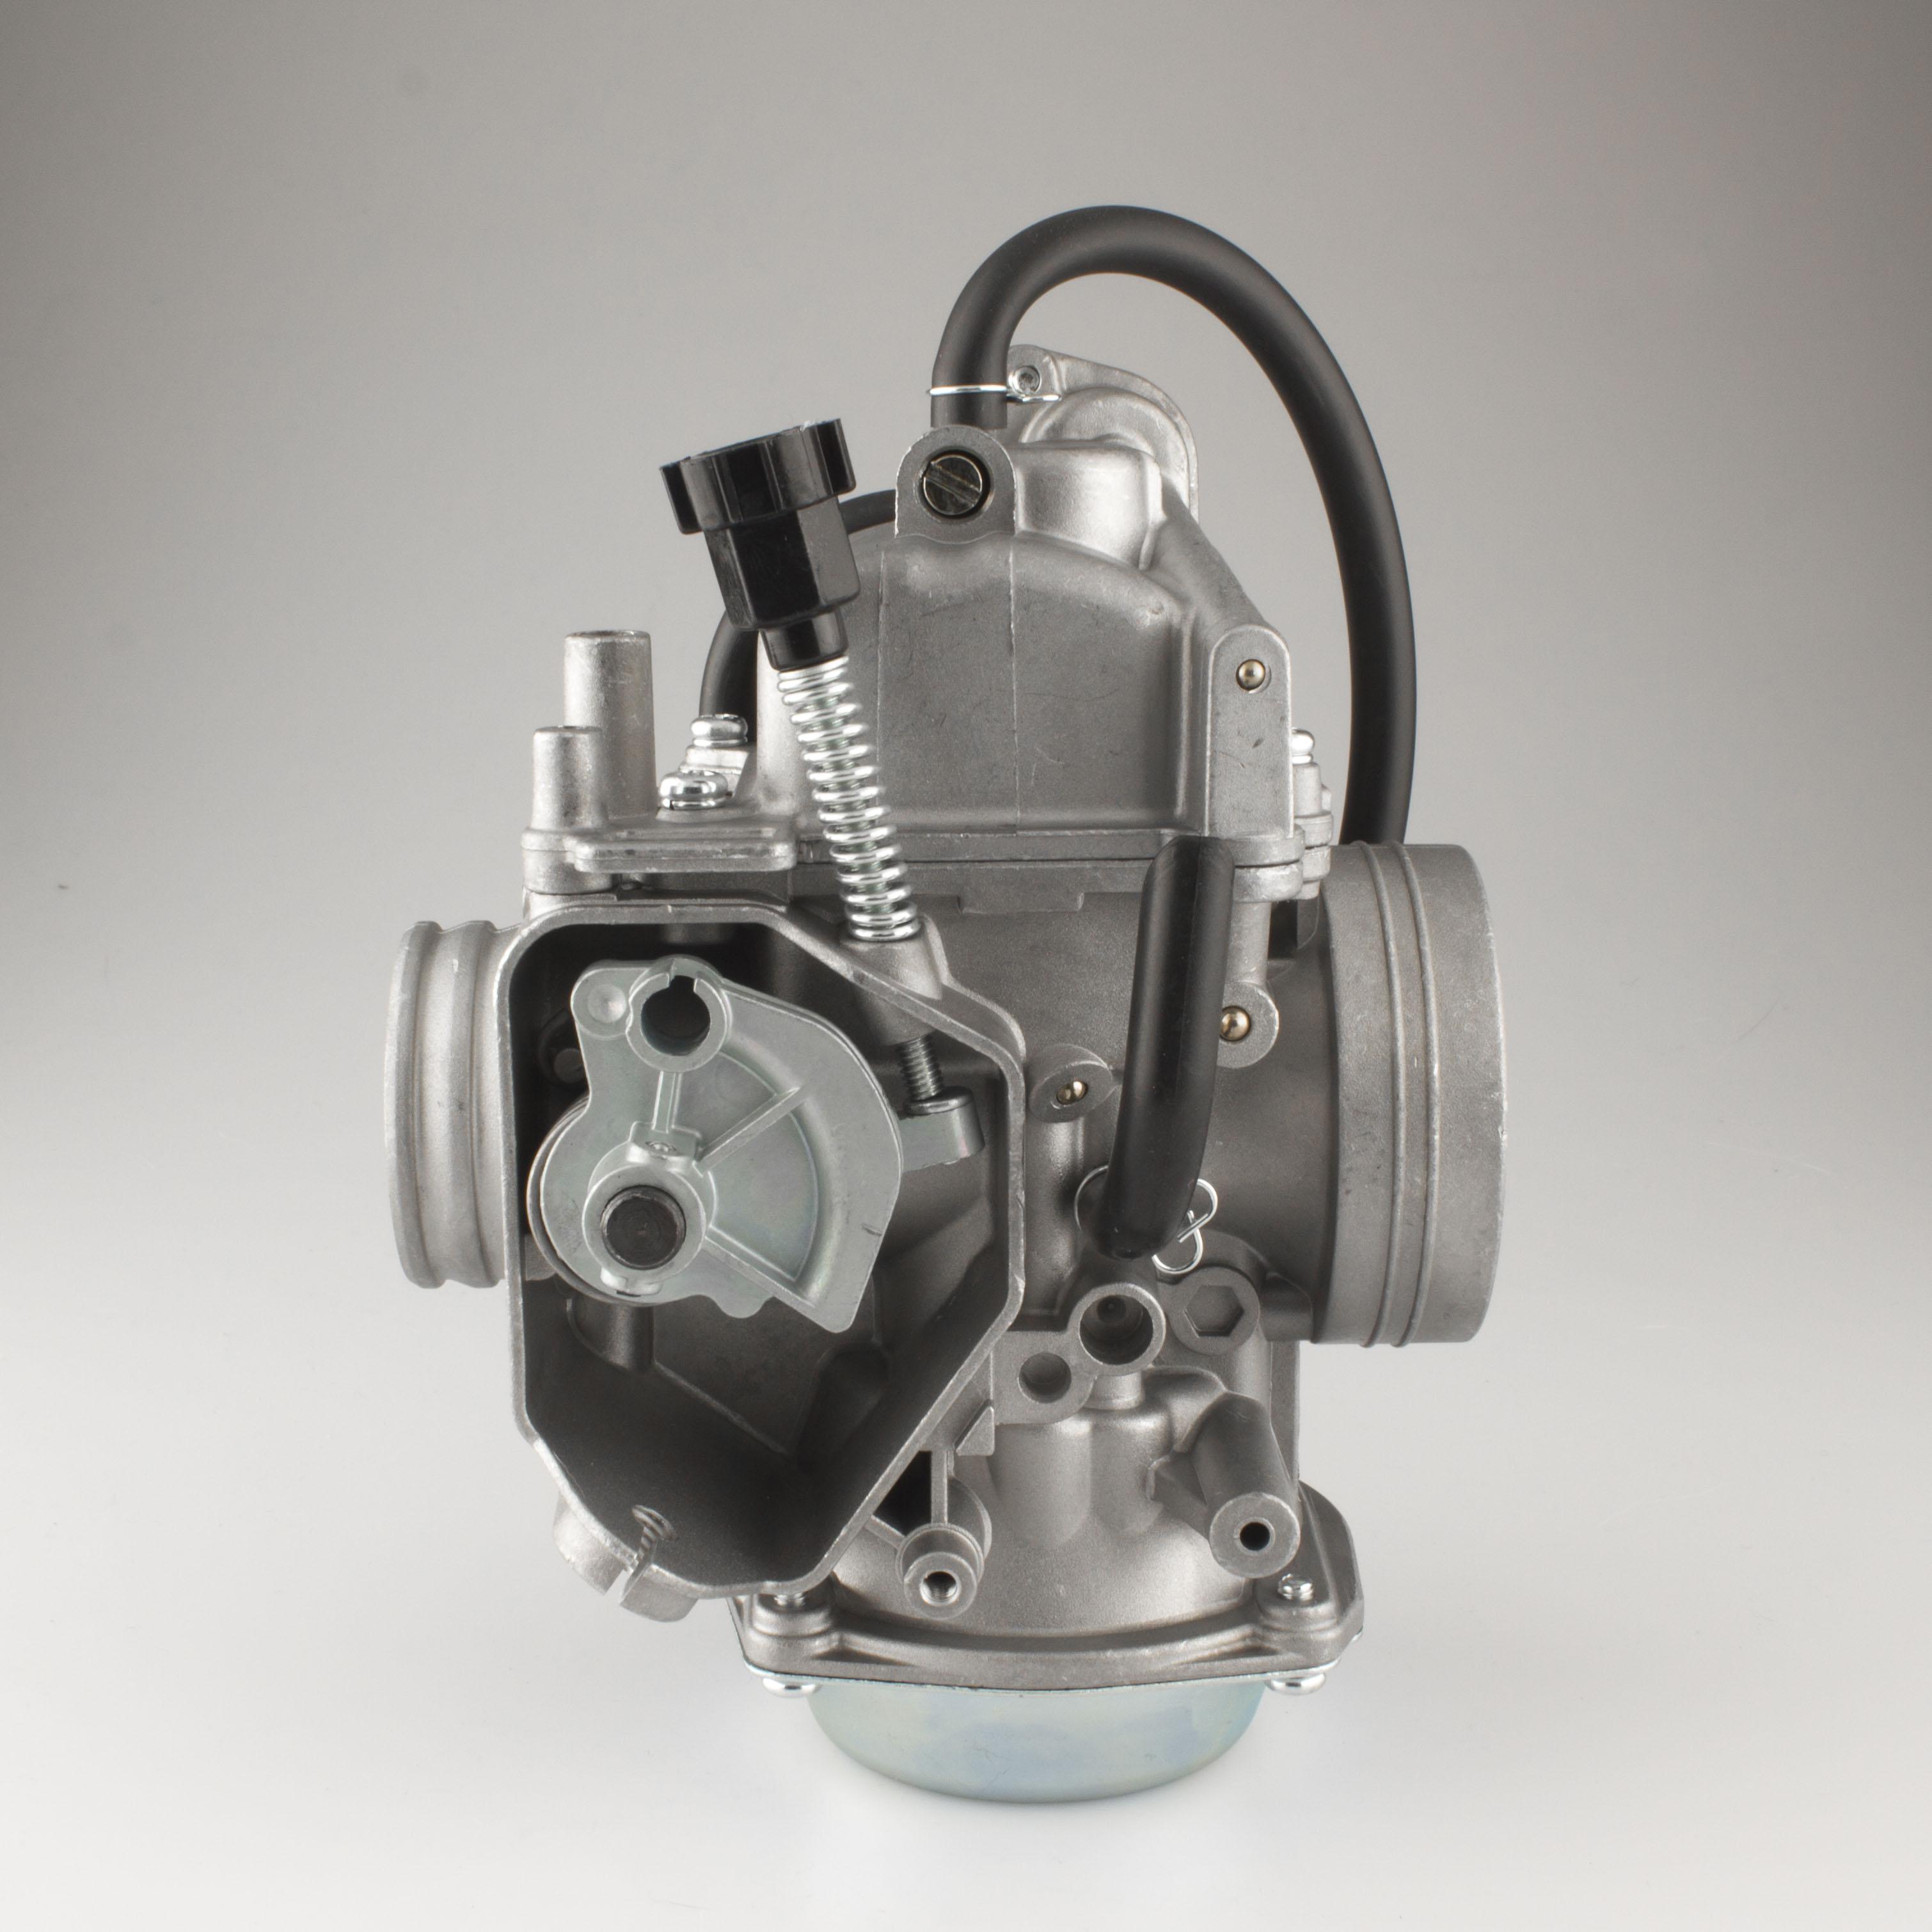 1PZ HX3-C01 Carburetor Carb Replacement Parts for Honda 300 Fourtrax 1988  1989 1990 1991 1992 1993 1994 1995 1996 1997 1998 1999 2000